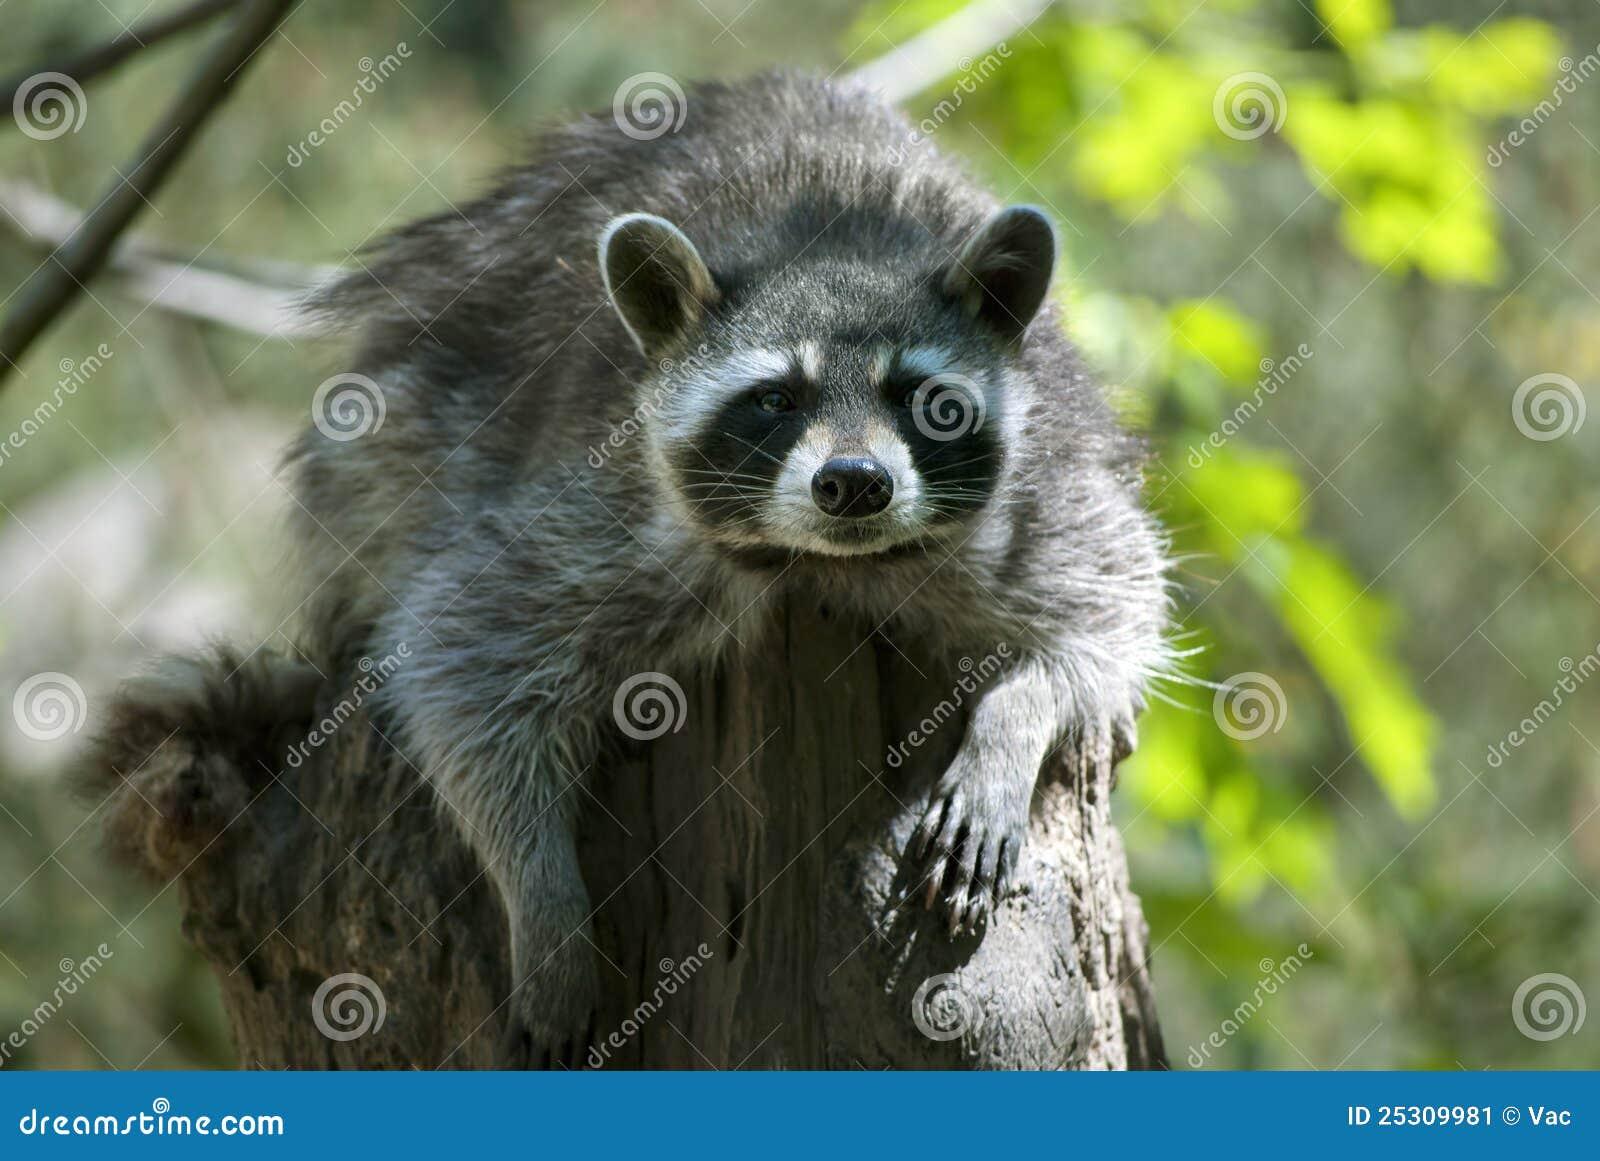 Raccoon Stock Image - Image: 25309981 Raccoon With No Hair